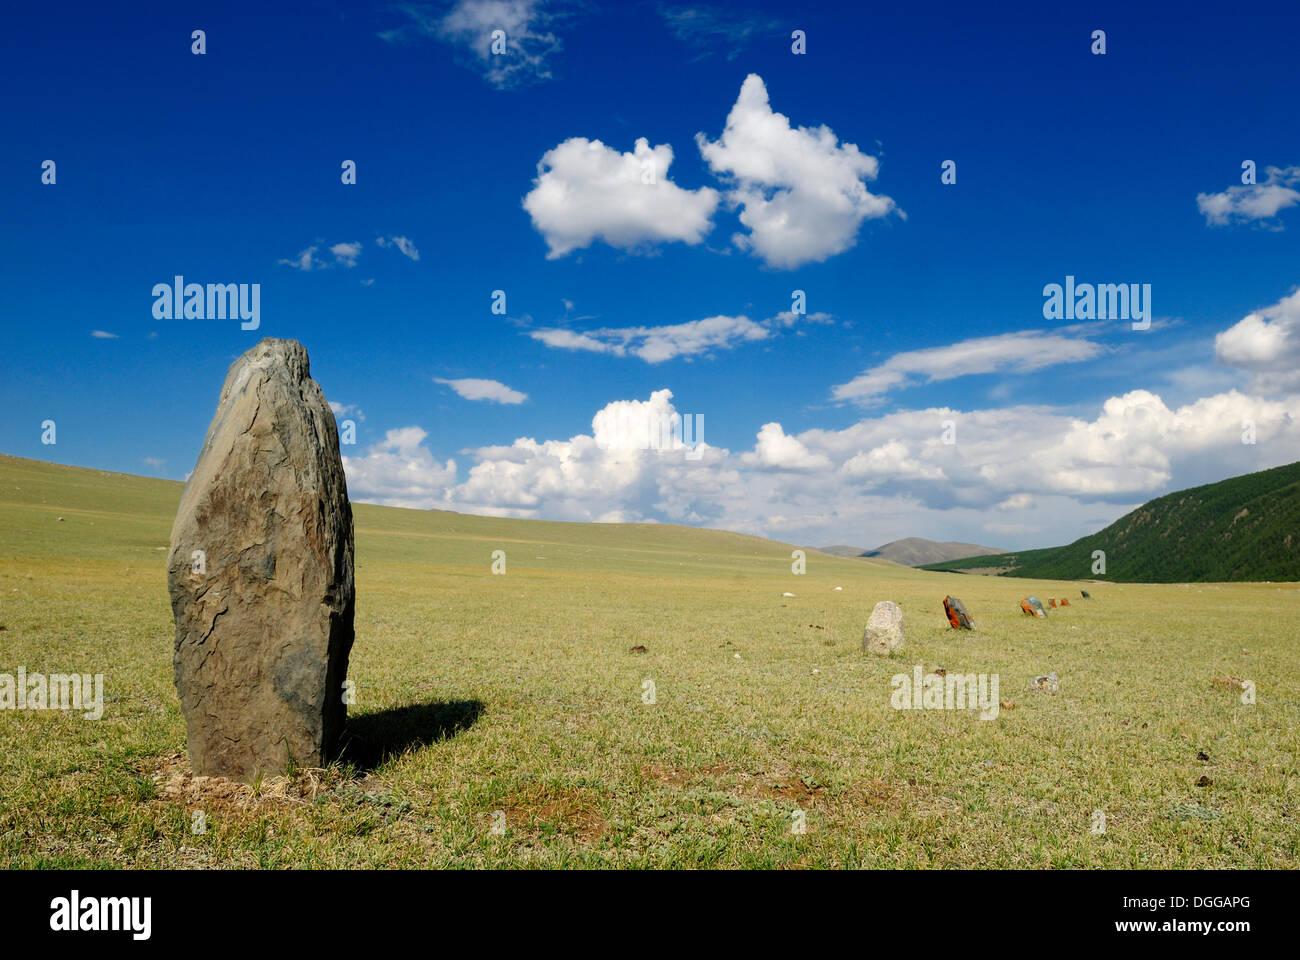 Prehistorical Steinsetzung, Saljugem, Sailughem, Saylyugem Mountains, Chuya Steppe, Altai Republic, Siberia, Russia, Asia - Stock Image